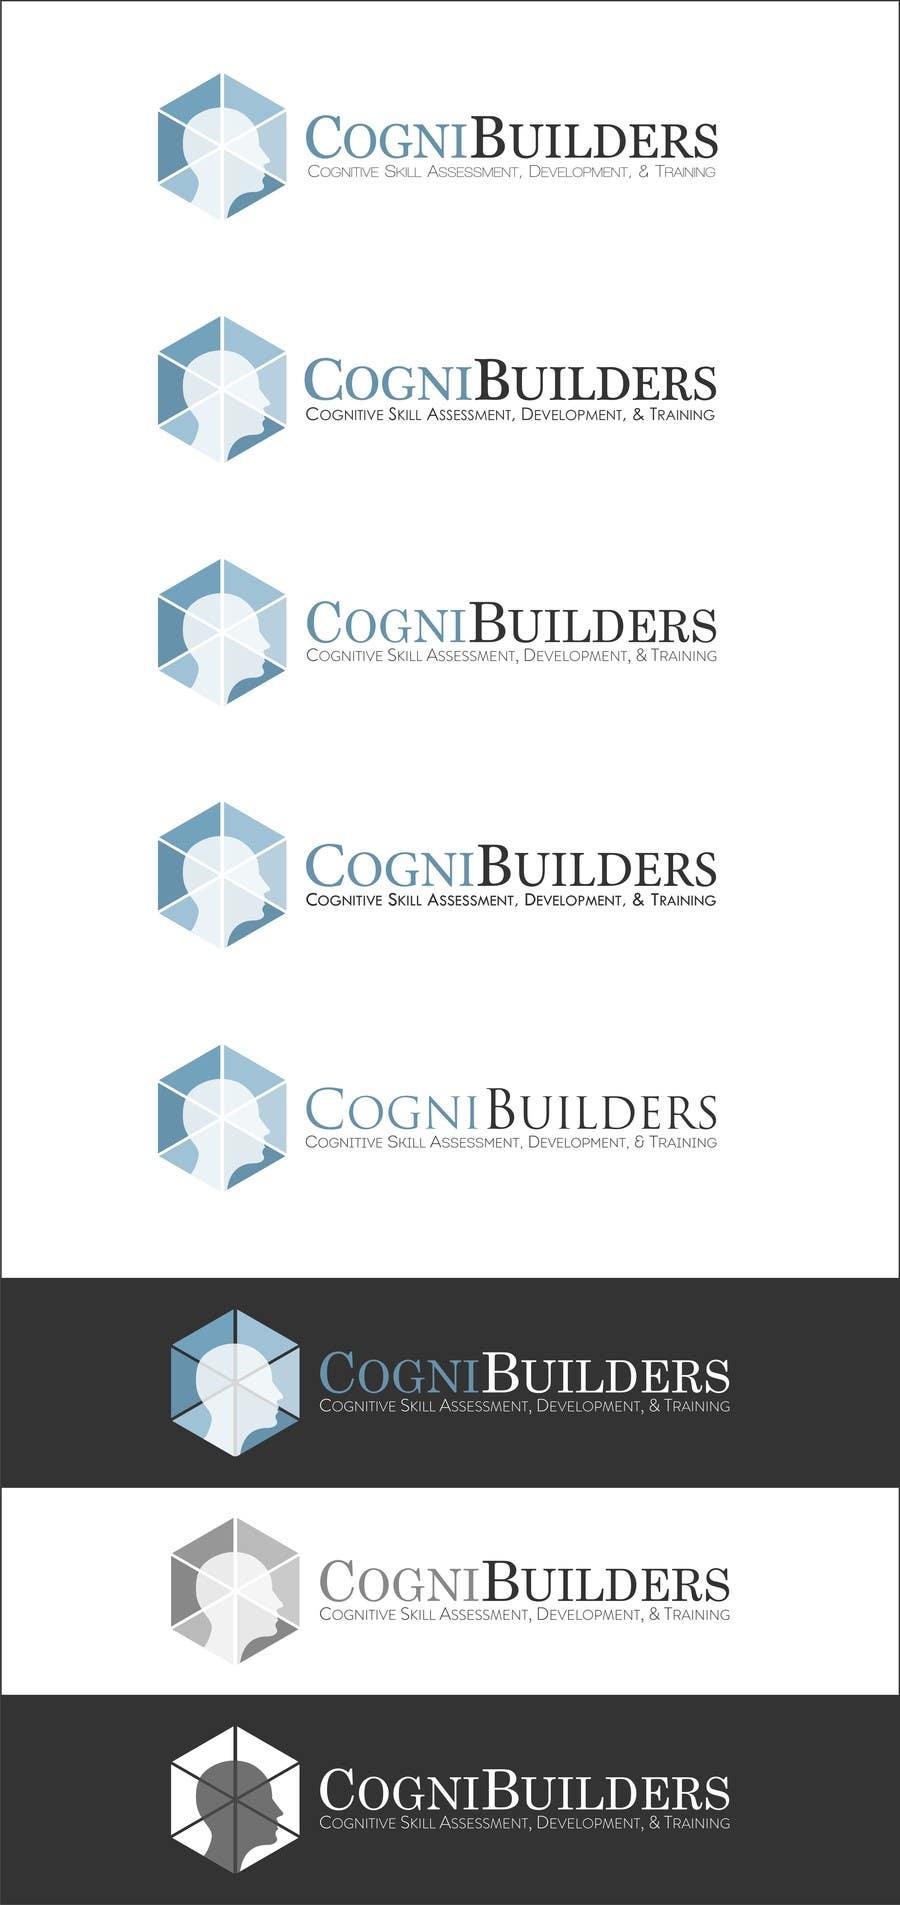 Penyertaan Peraduan #                                        84                                      untuk                                         Design a Logo for Cognibuilders